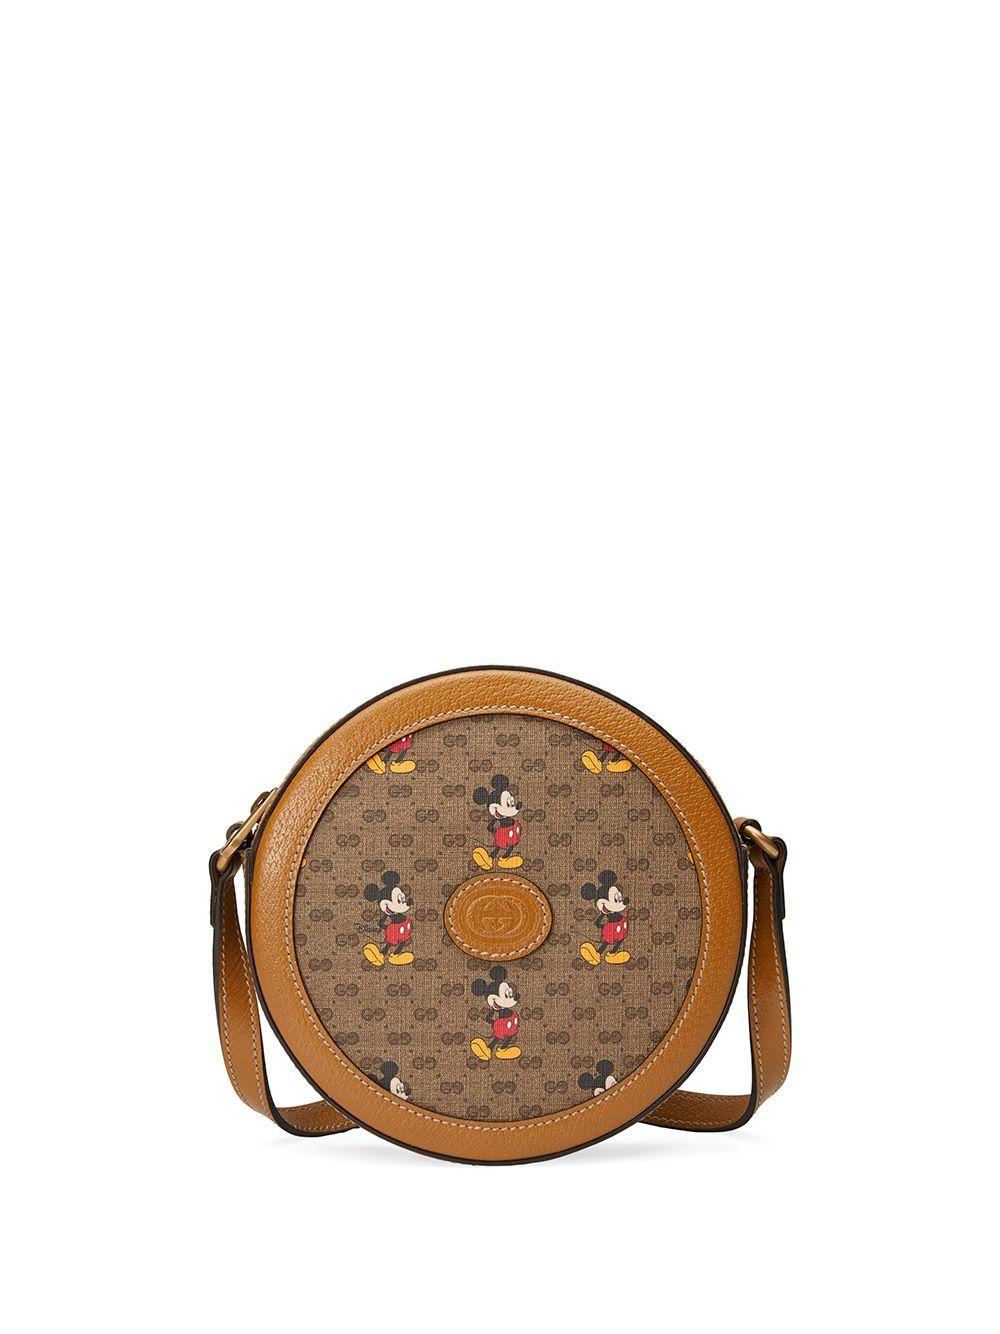 Gucci X Disney Mickey Mouse Print Shoulder Bag Farfetch In 2020 Mickey Mouse Bag Disney Purse Mouse Print